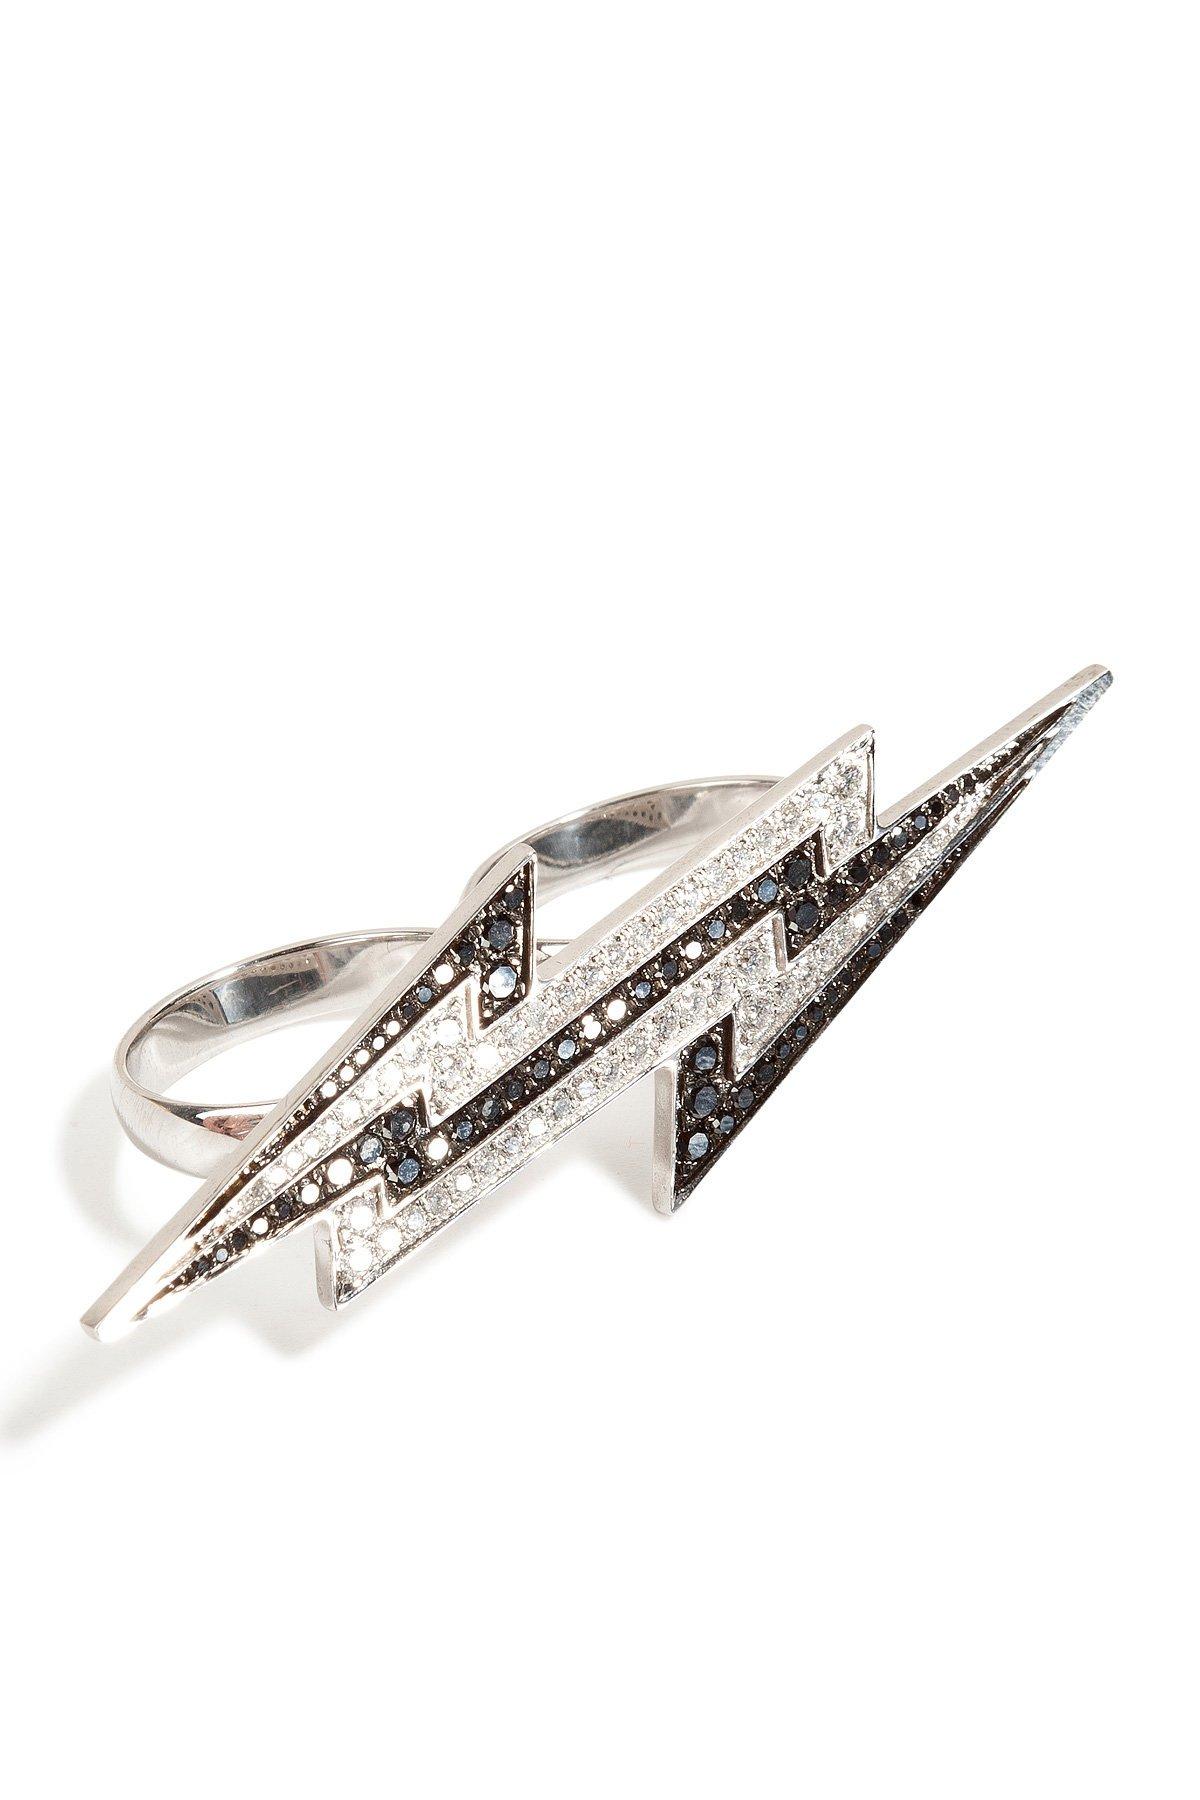 Sterling Silver Lightening Bolt Ring with Diamonds Gr. 6.5